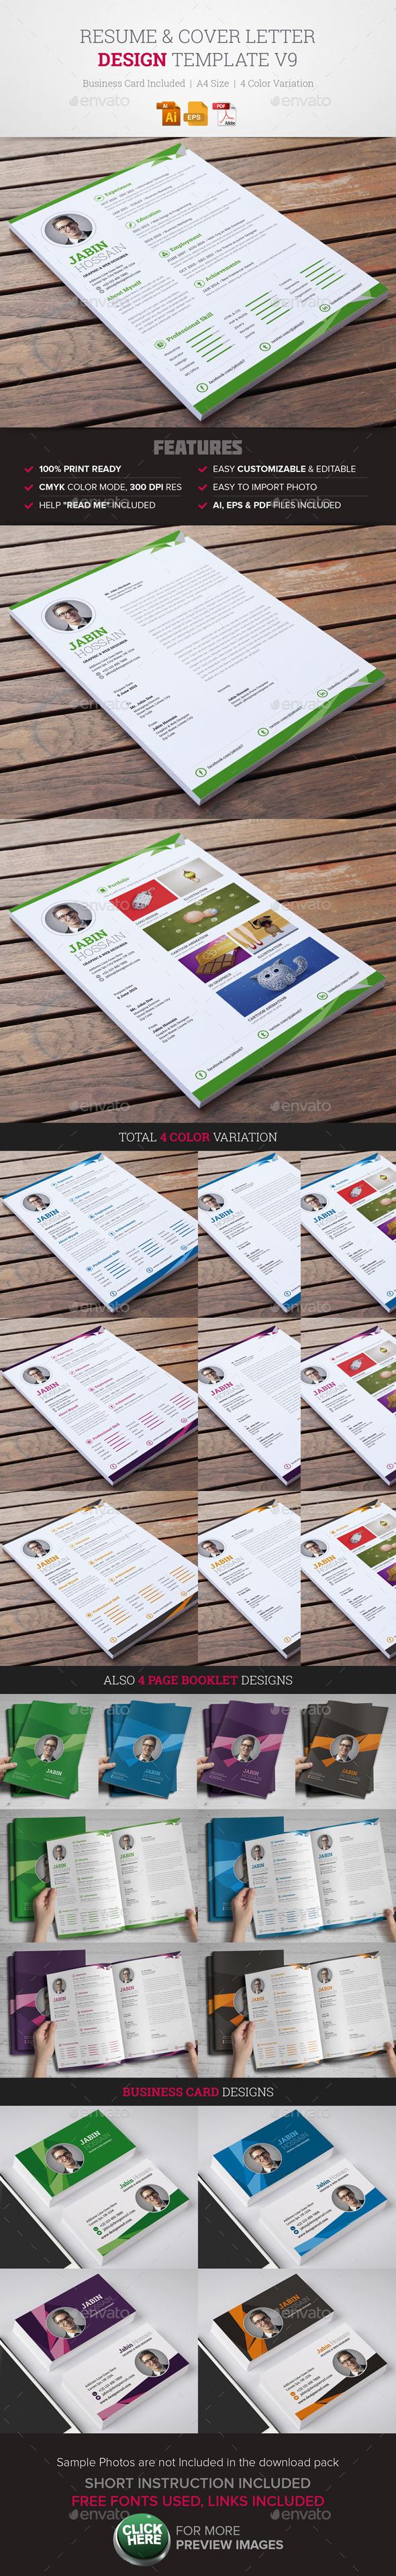 Resume & Cover Letter Template v9 - Resumes Stationery